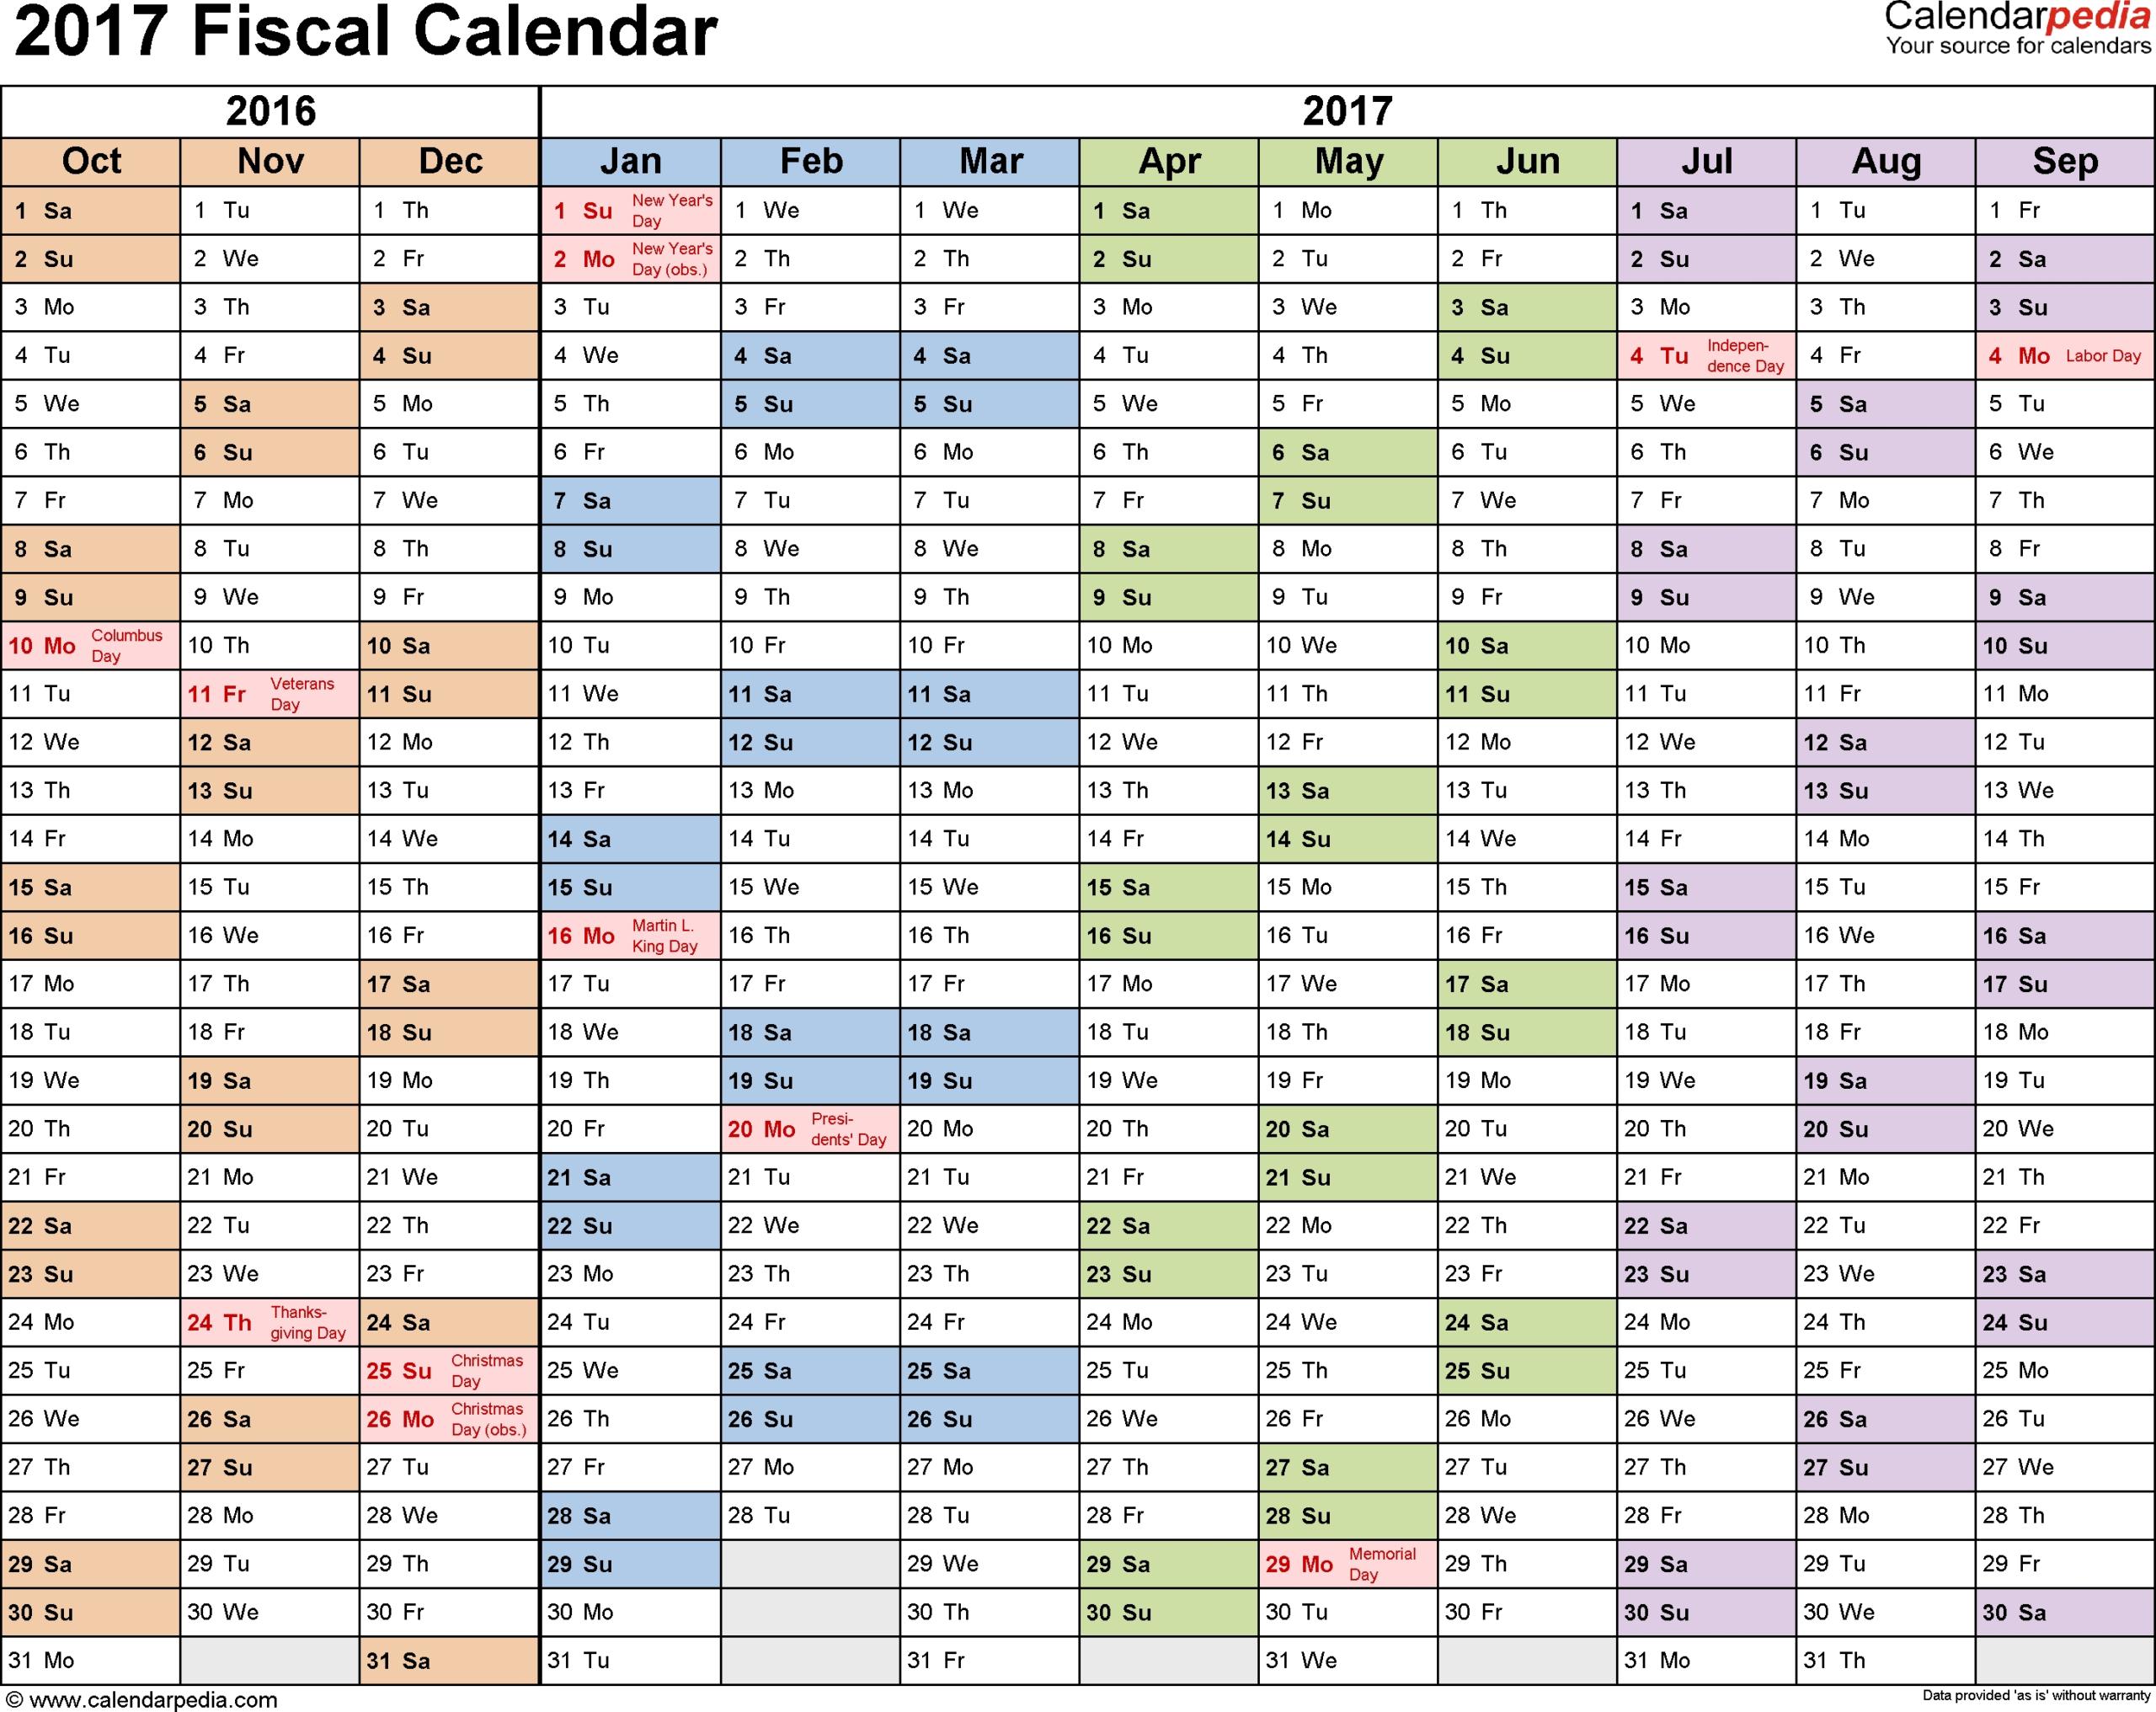 End Of Year Calendar | Ten Free Printable Calendar 20202021 with Ocsb School Year Calendar